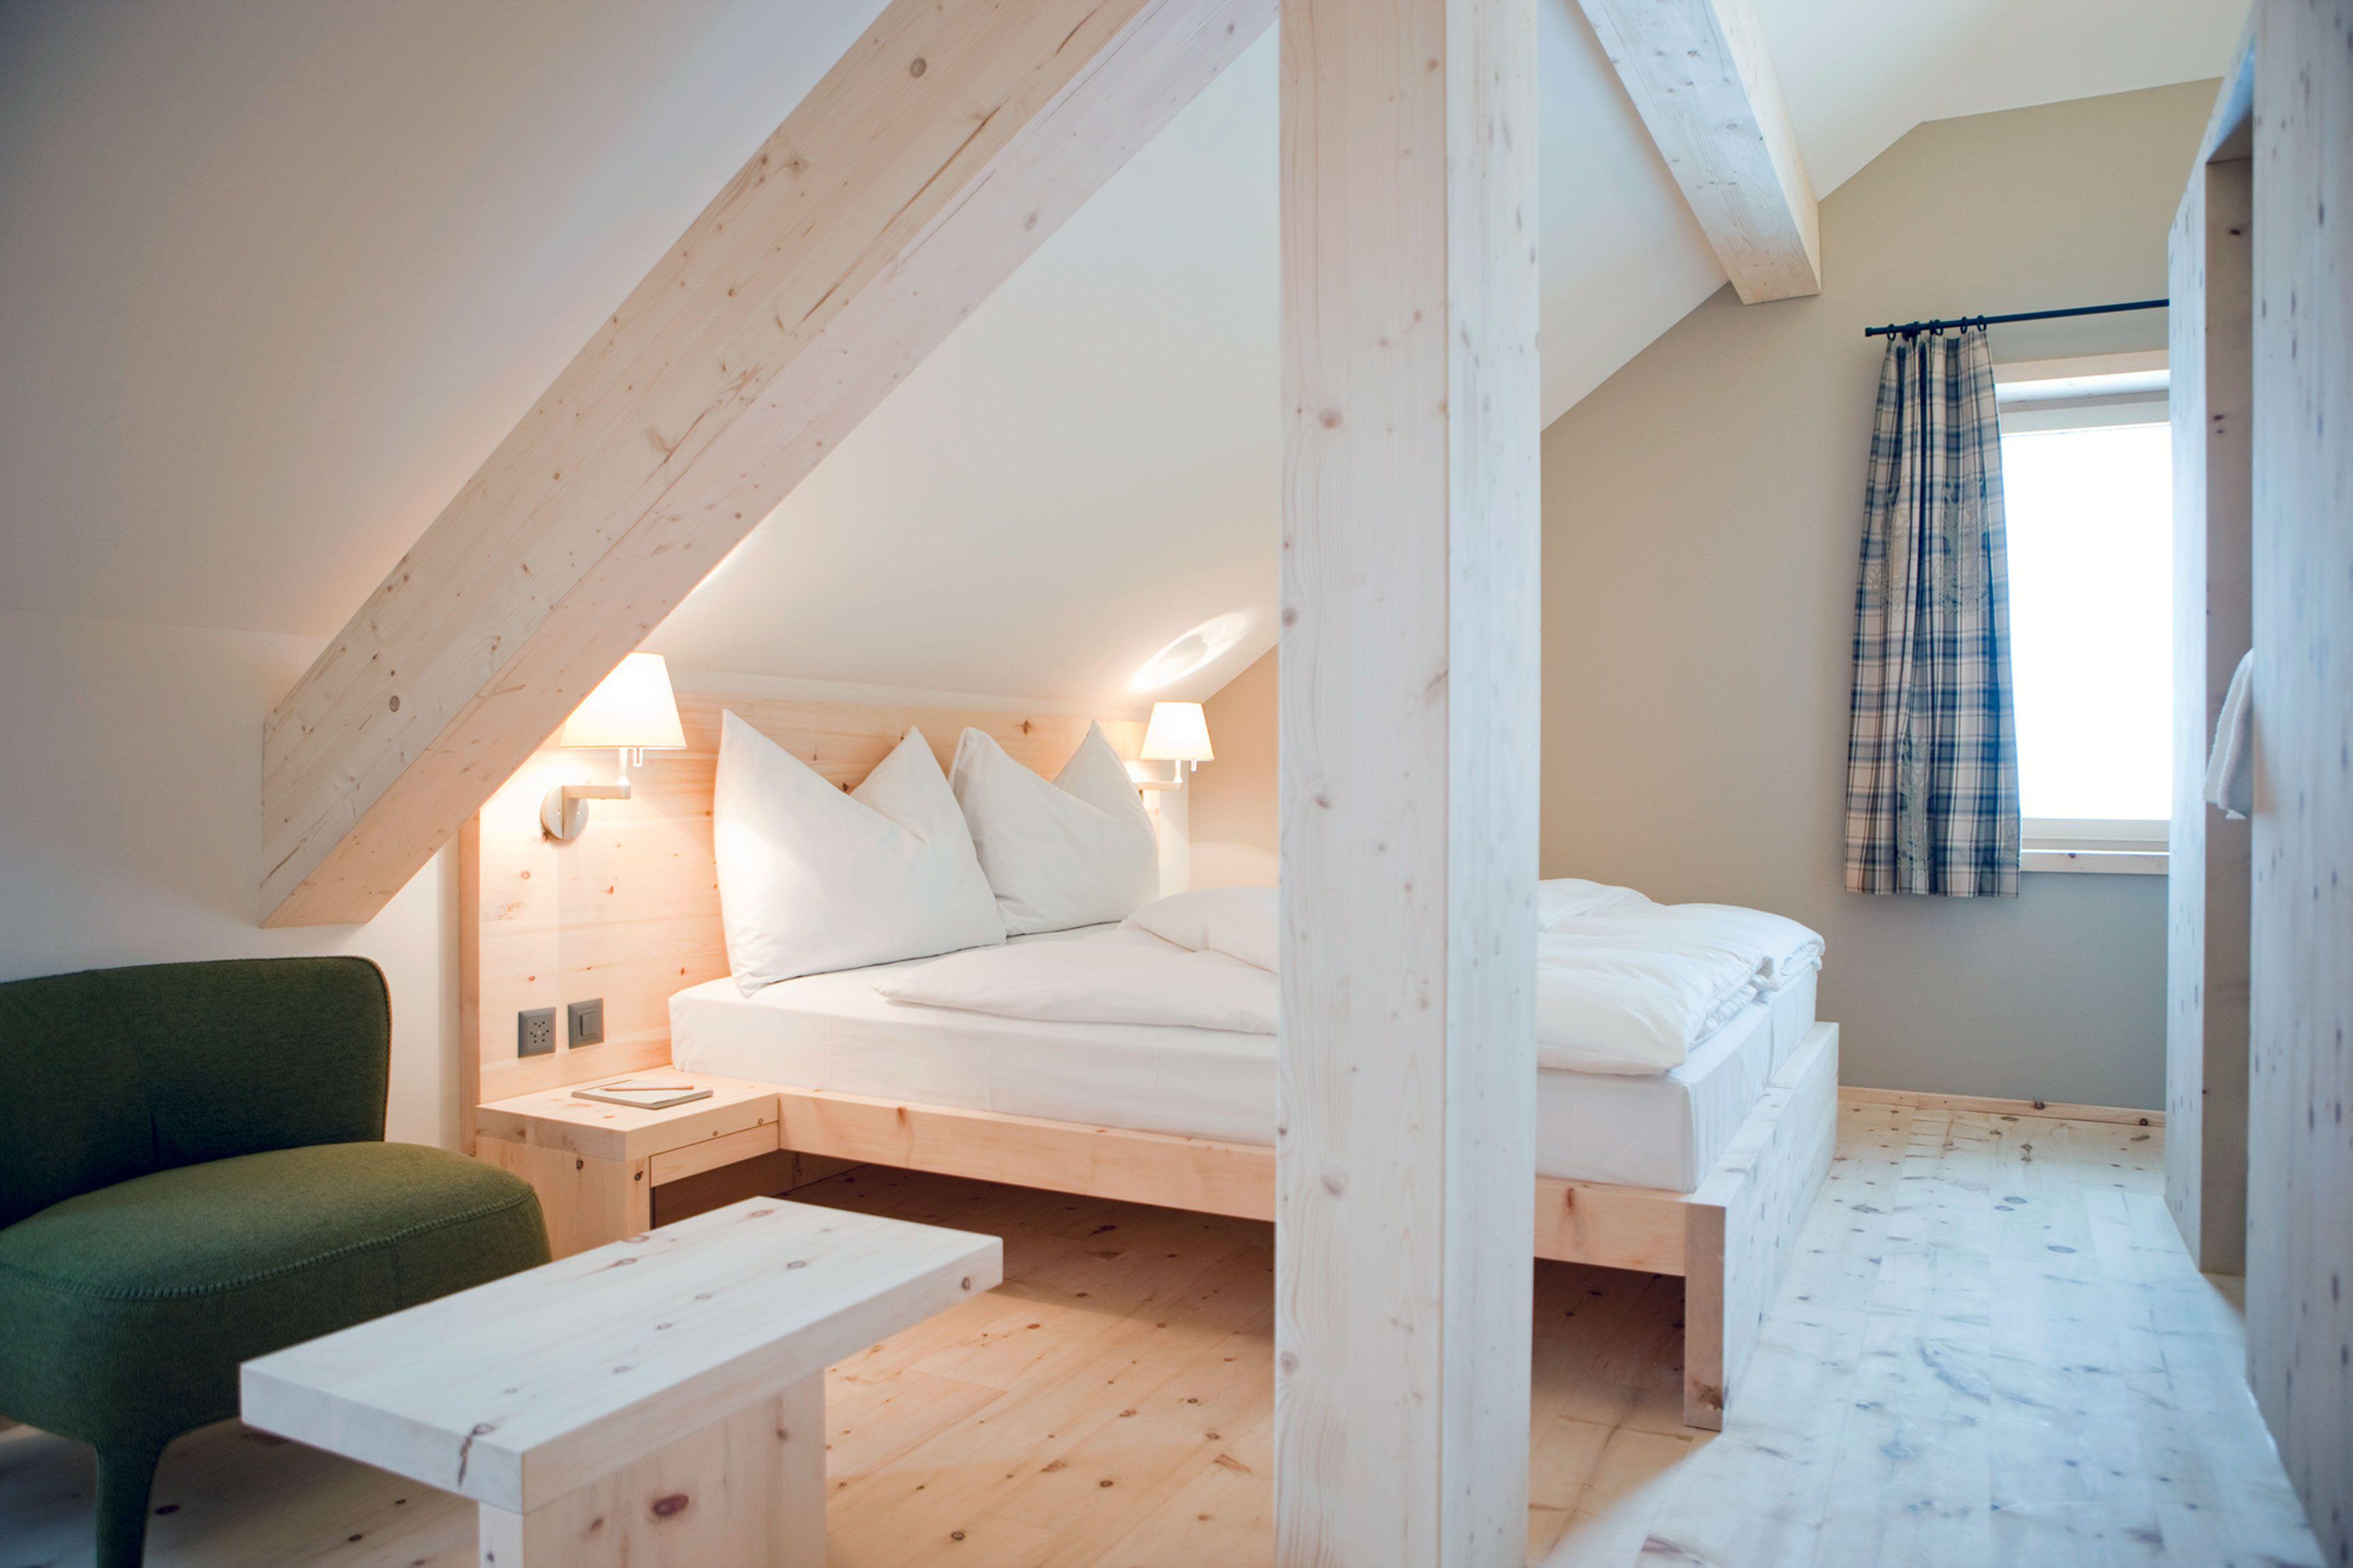 Small attic loft bedroom ideas  Pin by ale san on Cosy attic  Pinterest  Bedroom Attic and Attic